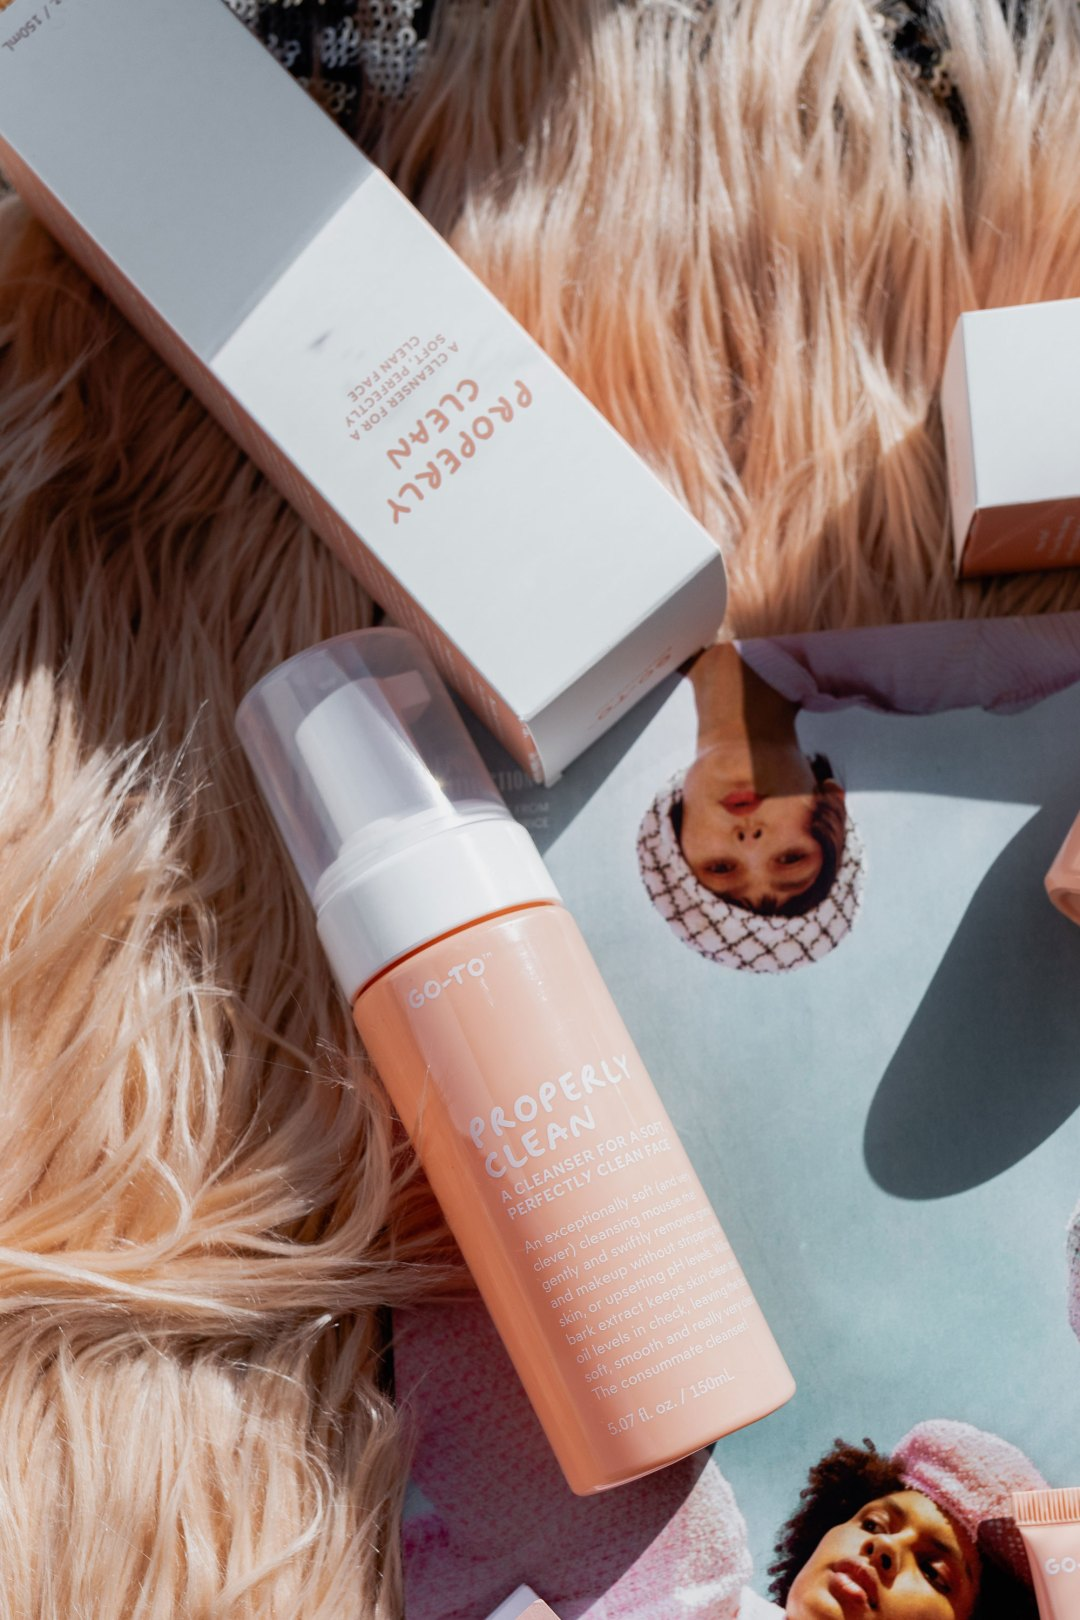 3-New-Cruelty-Free-Vegan-Skincare-Products-Molly-Larsen-Beauty-Style-Arizona-Blogger-allaboutgoodvibes.com-IG-@TheVibesCloset